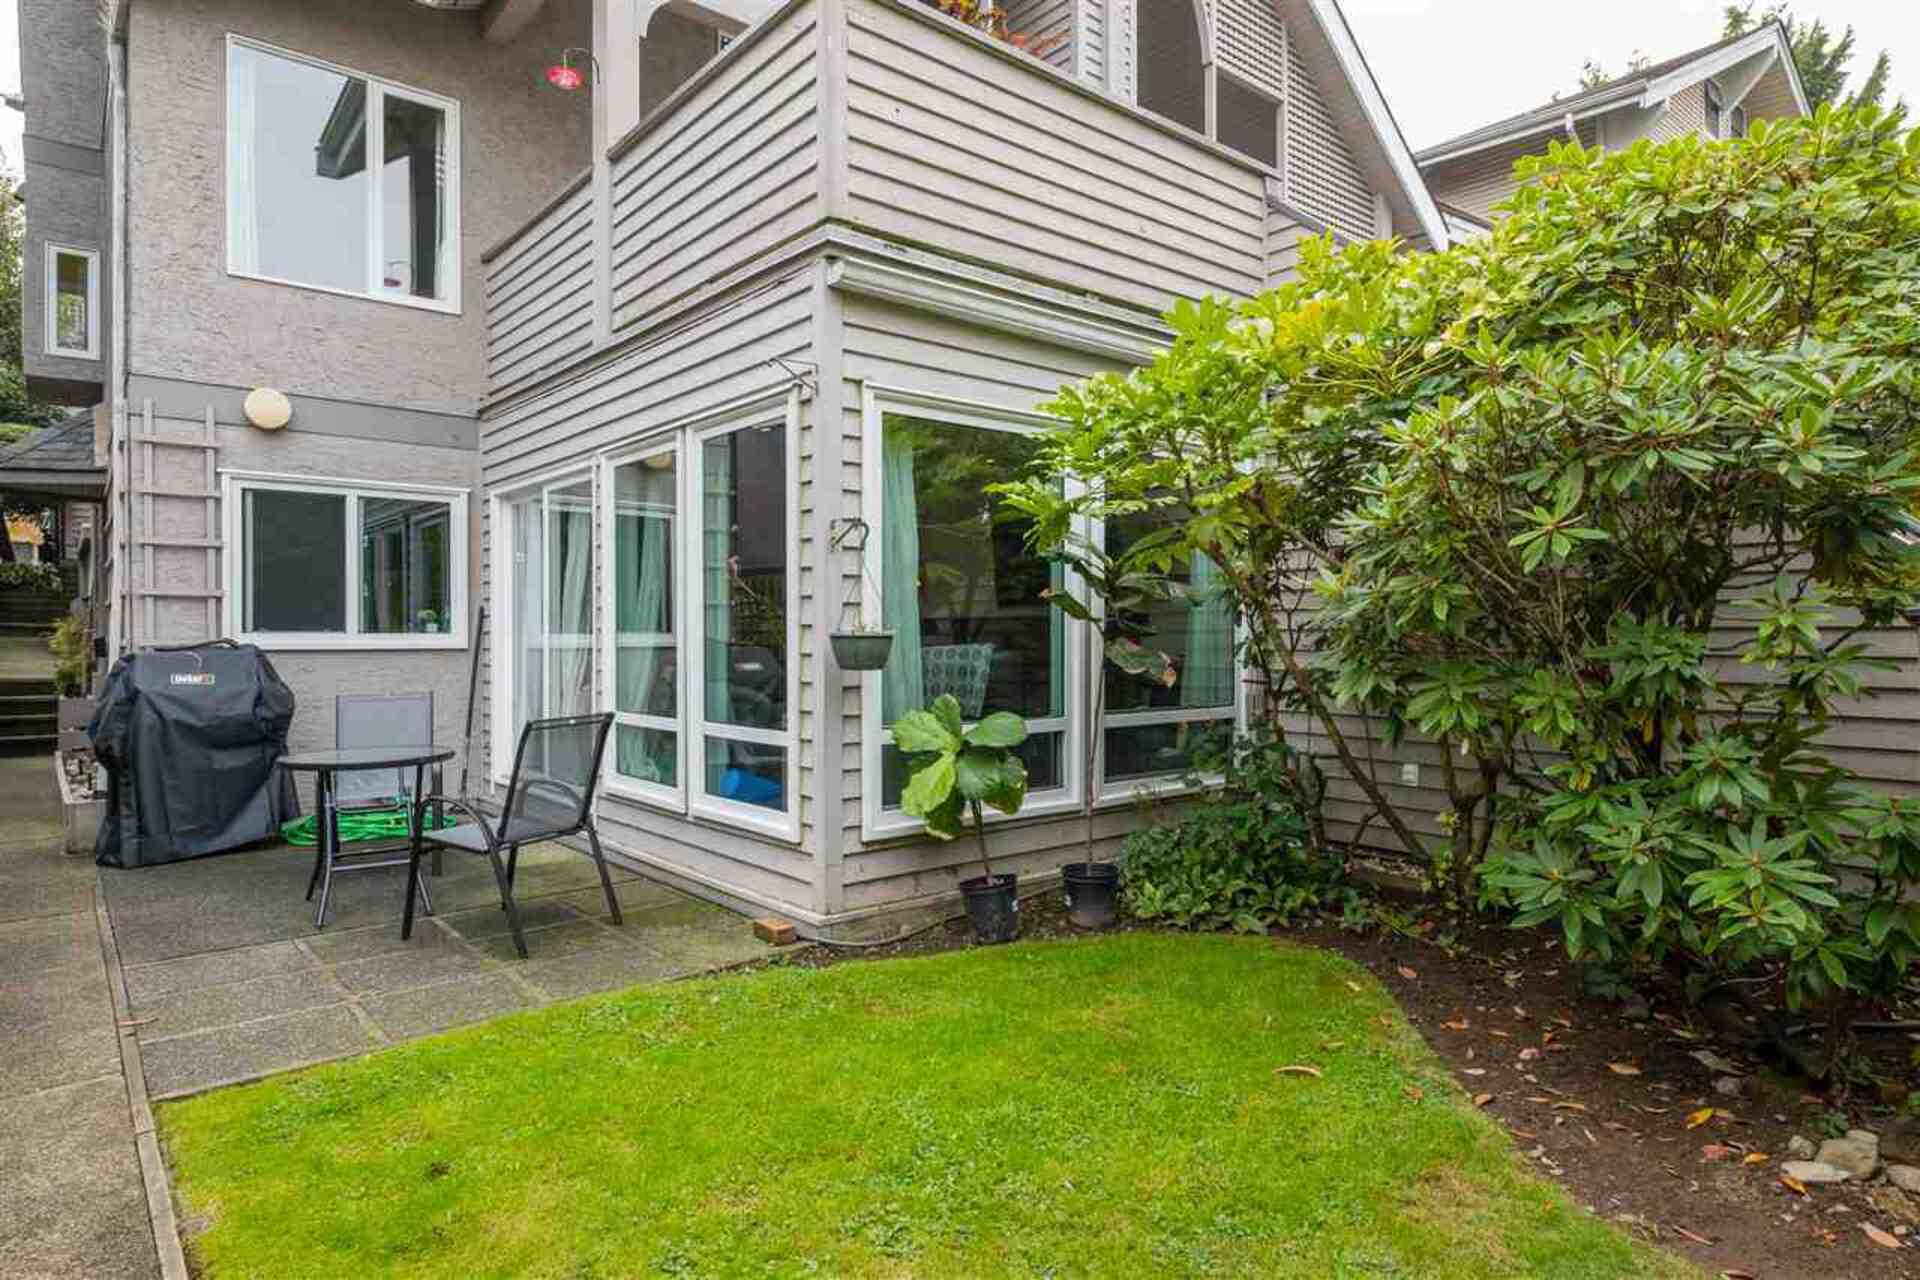 2536-cornwall-avenue-kitsilano-vancouver-west-19 at 2536 Cornwall Avenue, Kitsilano, Vancouver West